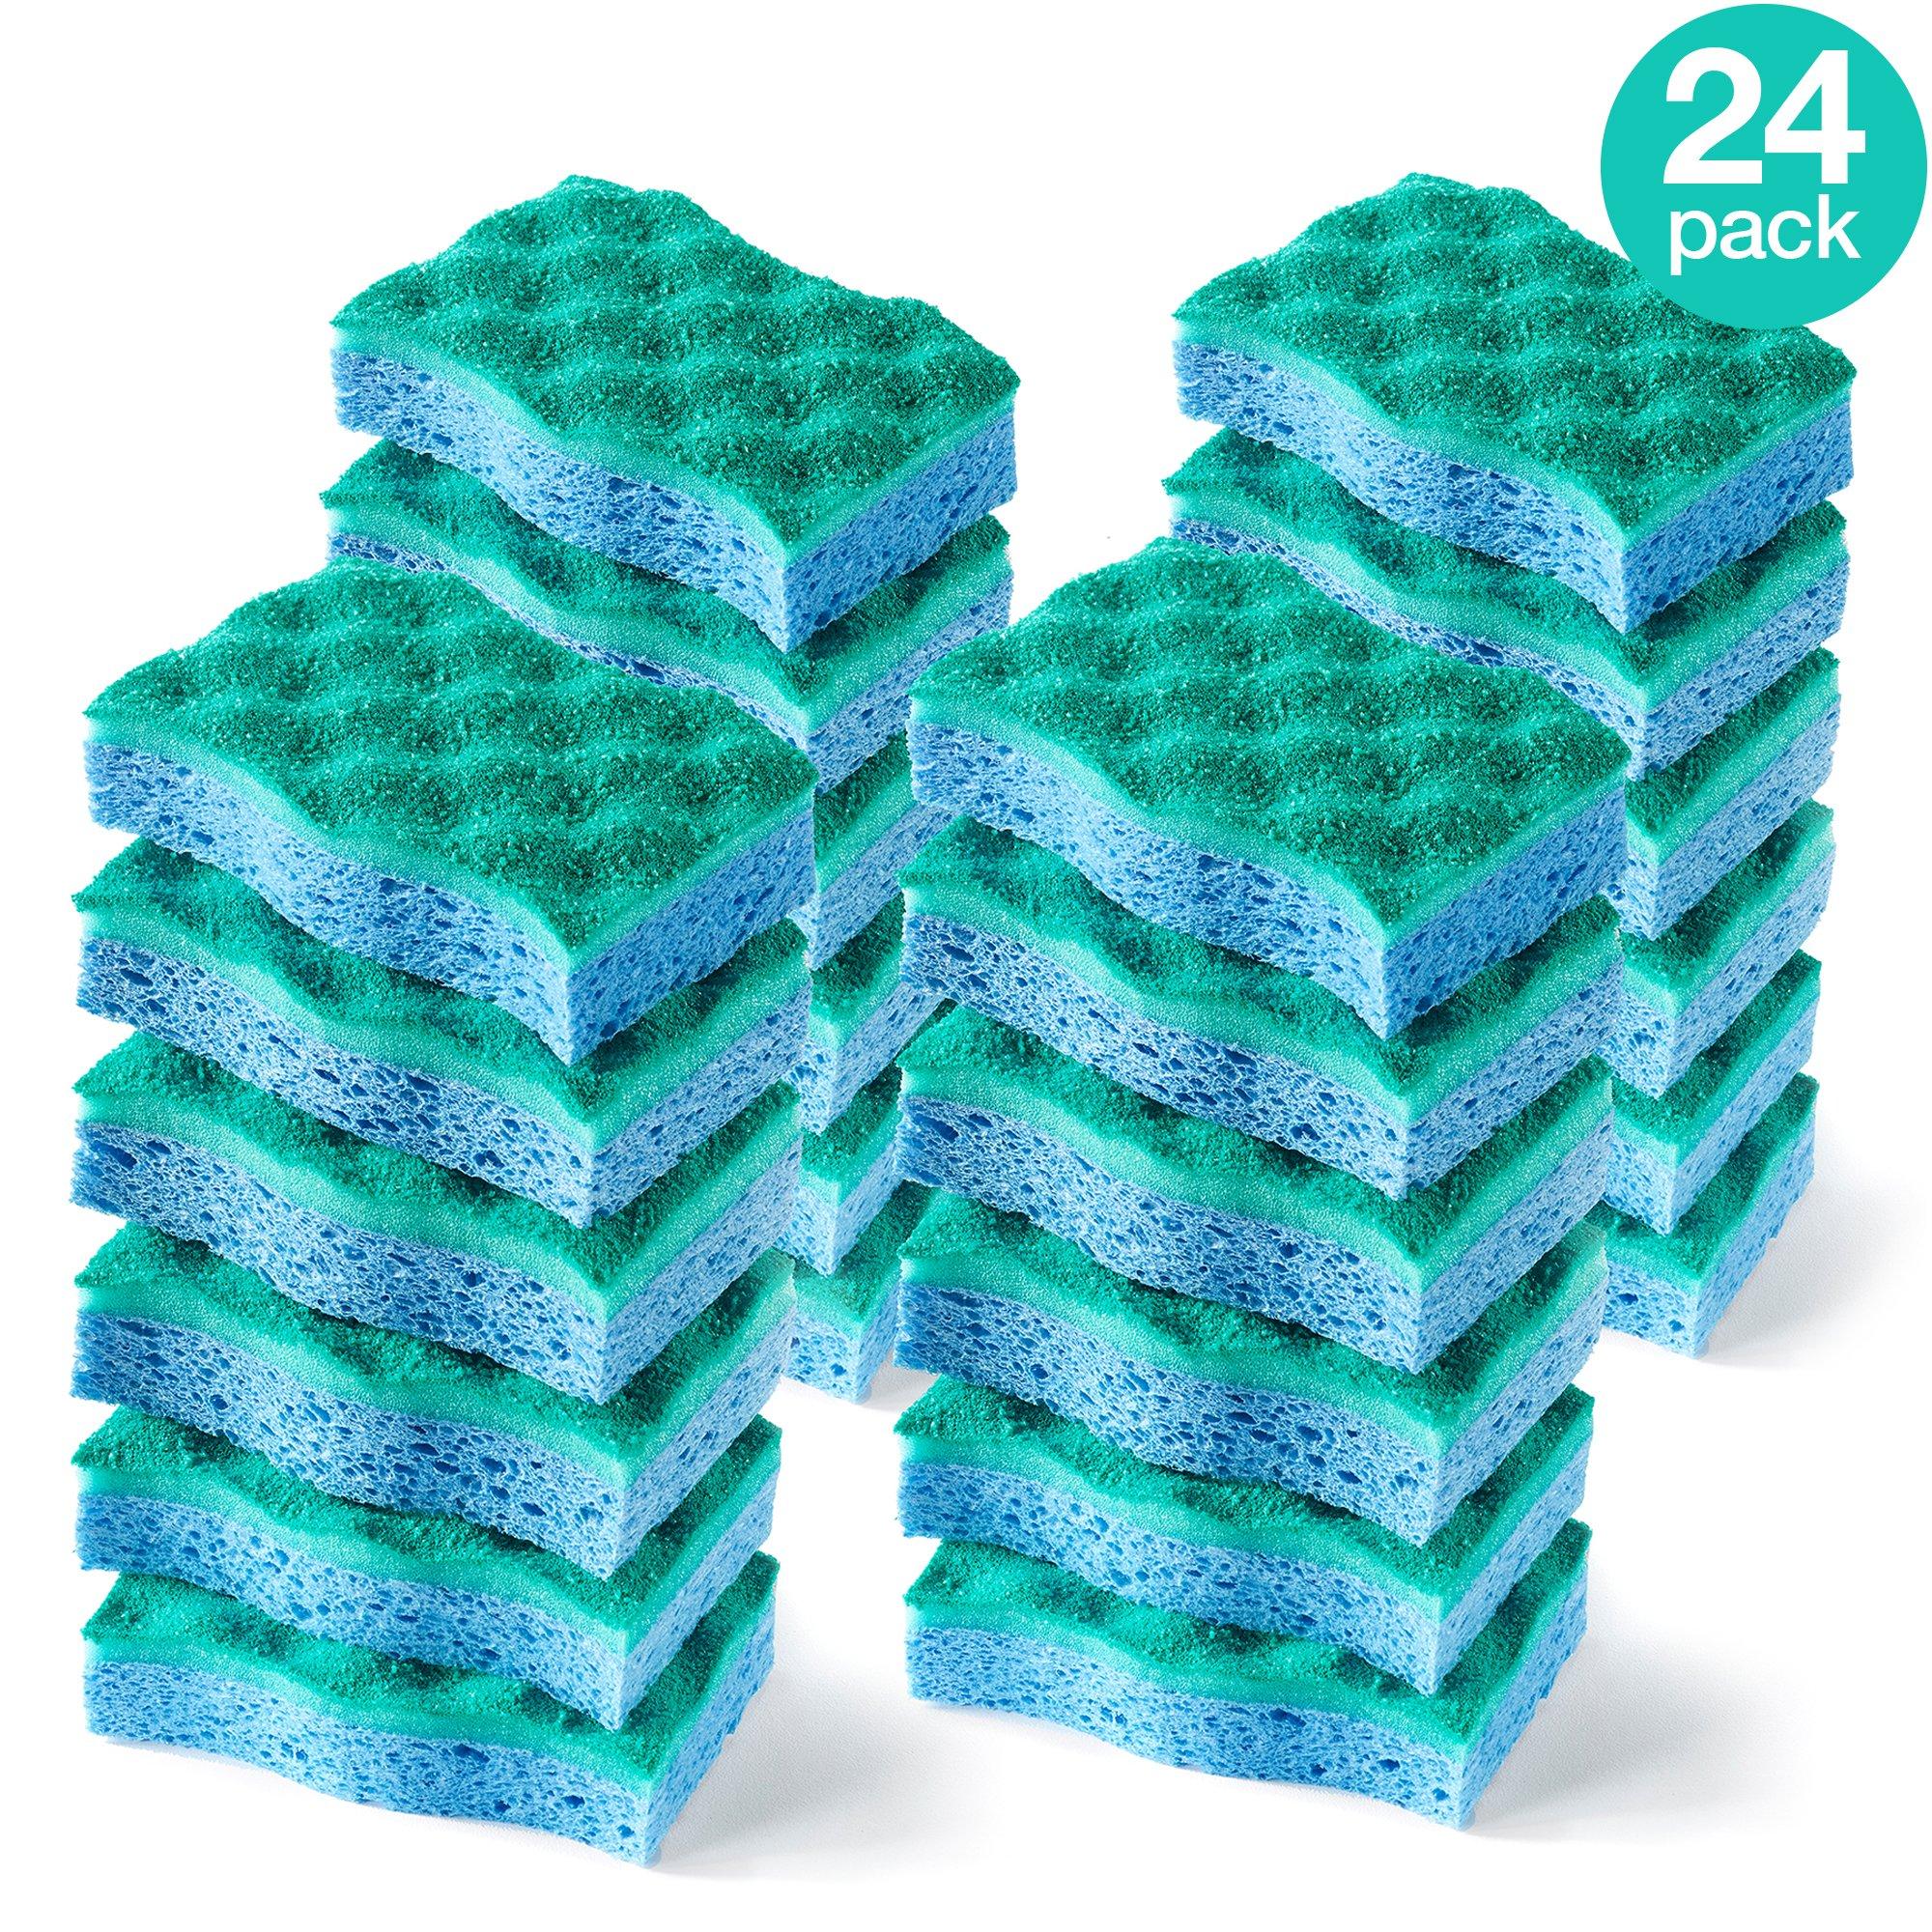 O-Cedar Multi-Use Scrunge Scrubber Sponge (Pack of 24) by O-Cedar (Image #1)